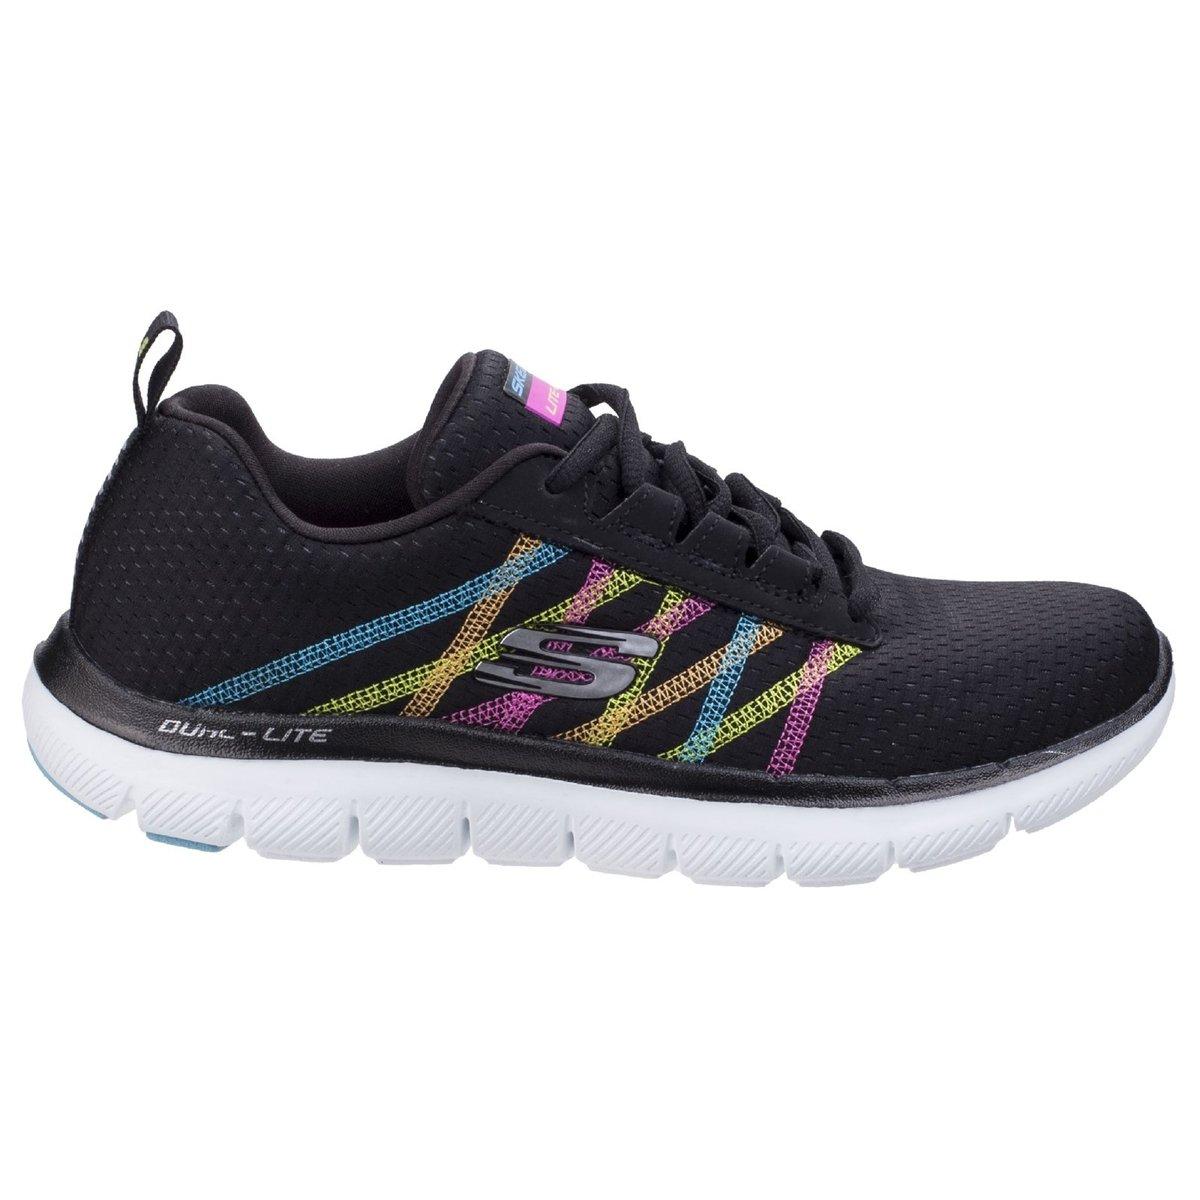 Skechers-Zapatillas-modelo-Flex-Appeal-2-0-Act-Cool-para-mujer-FS5197 miniatura 11